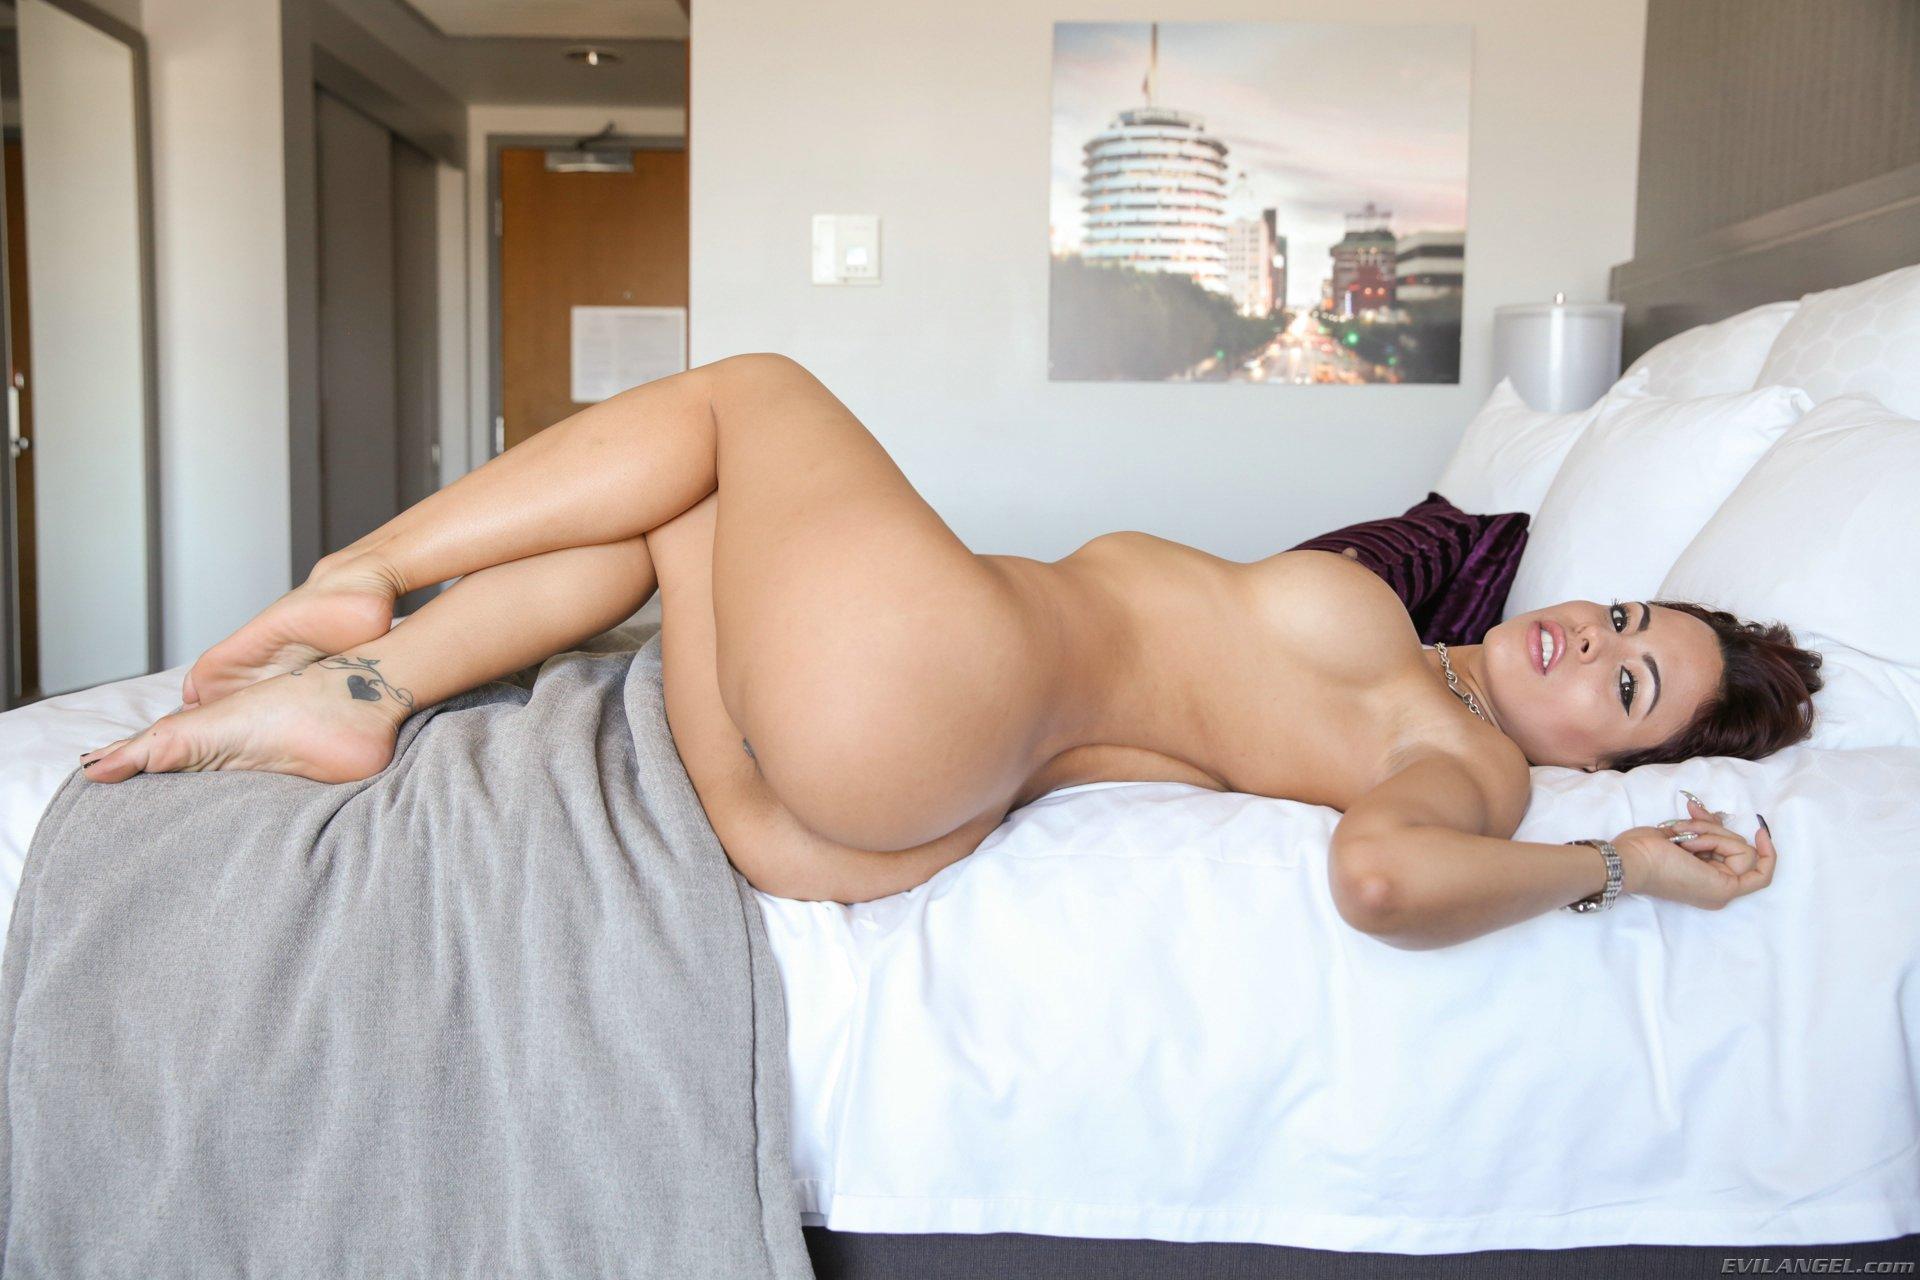 Vyzuba big tits blog